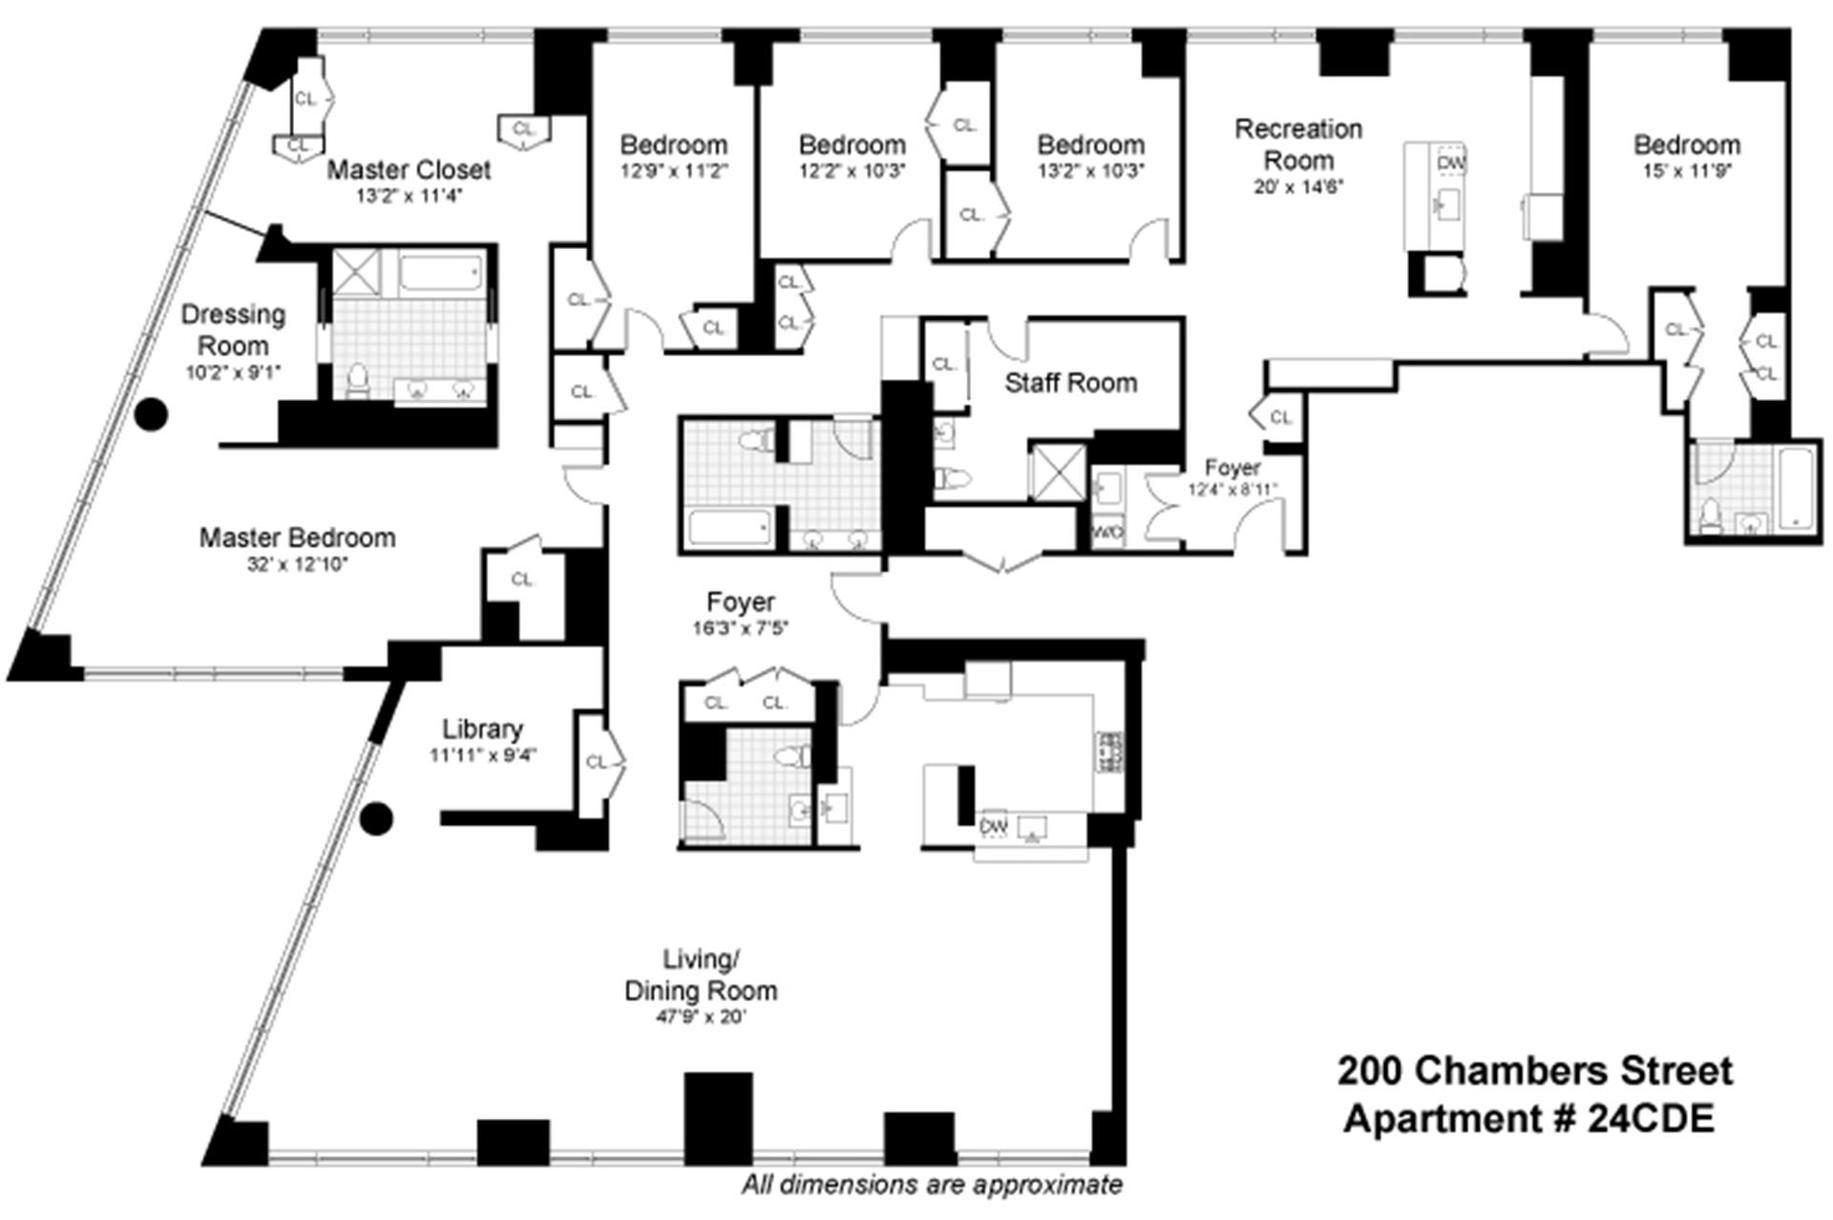 New York South Florida California Connecticut Colorado And New Jersey Real Estate Douglas Elliman Apartment Floor Plans Floor Plans Staff Room